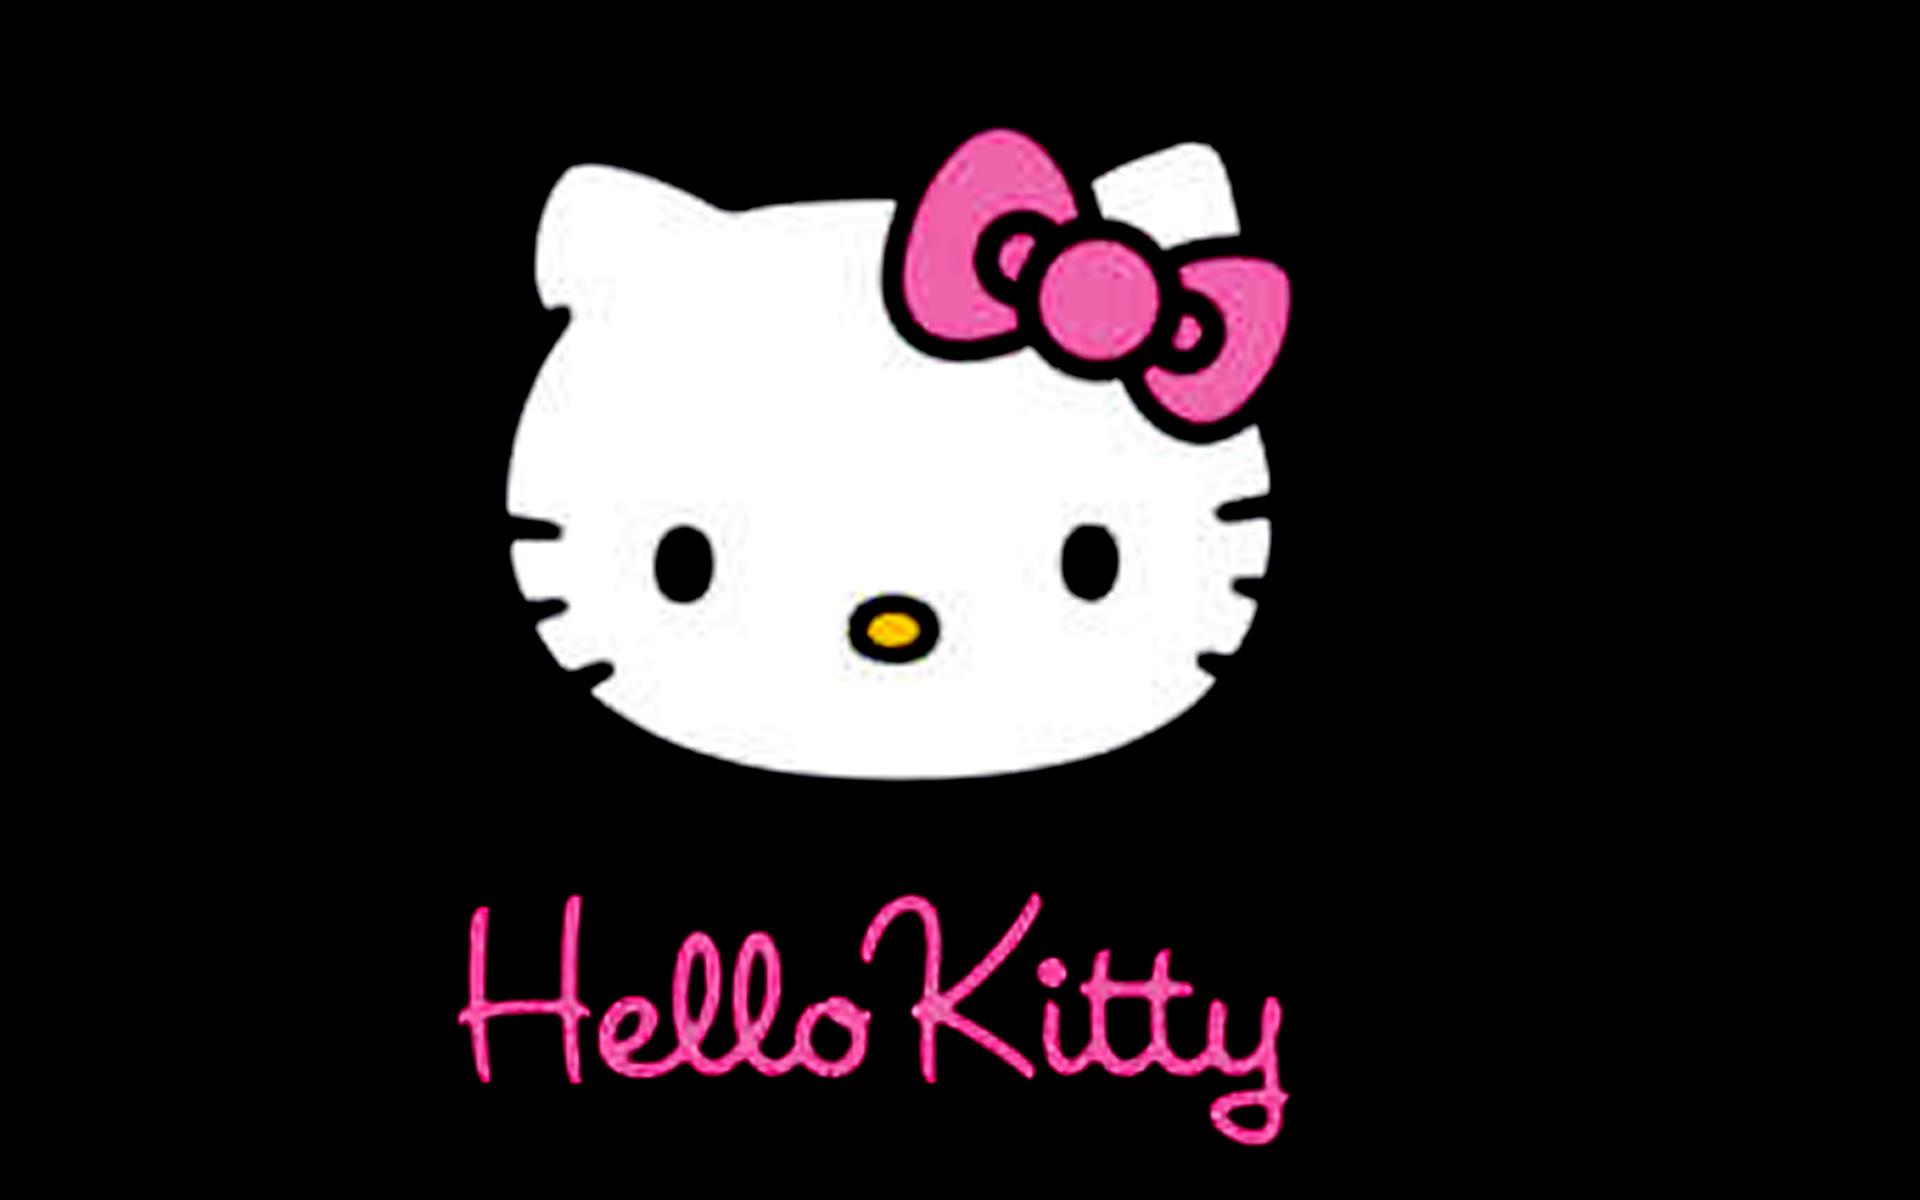 Download Hello Kitty Black Wallpaper 1920x1200 Full HD Wallpapers 1920x1200